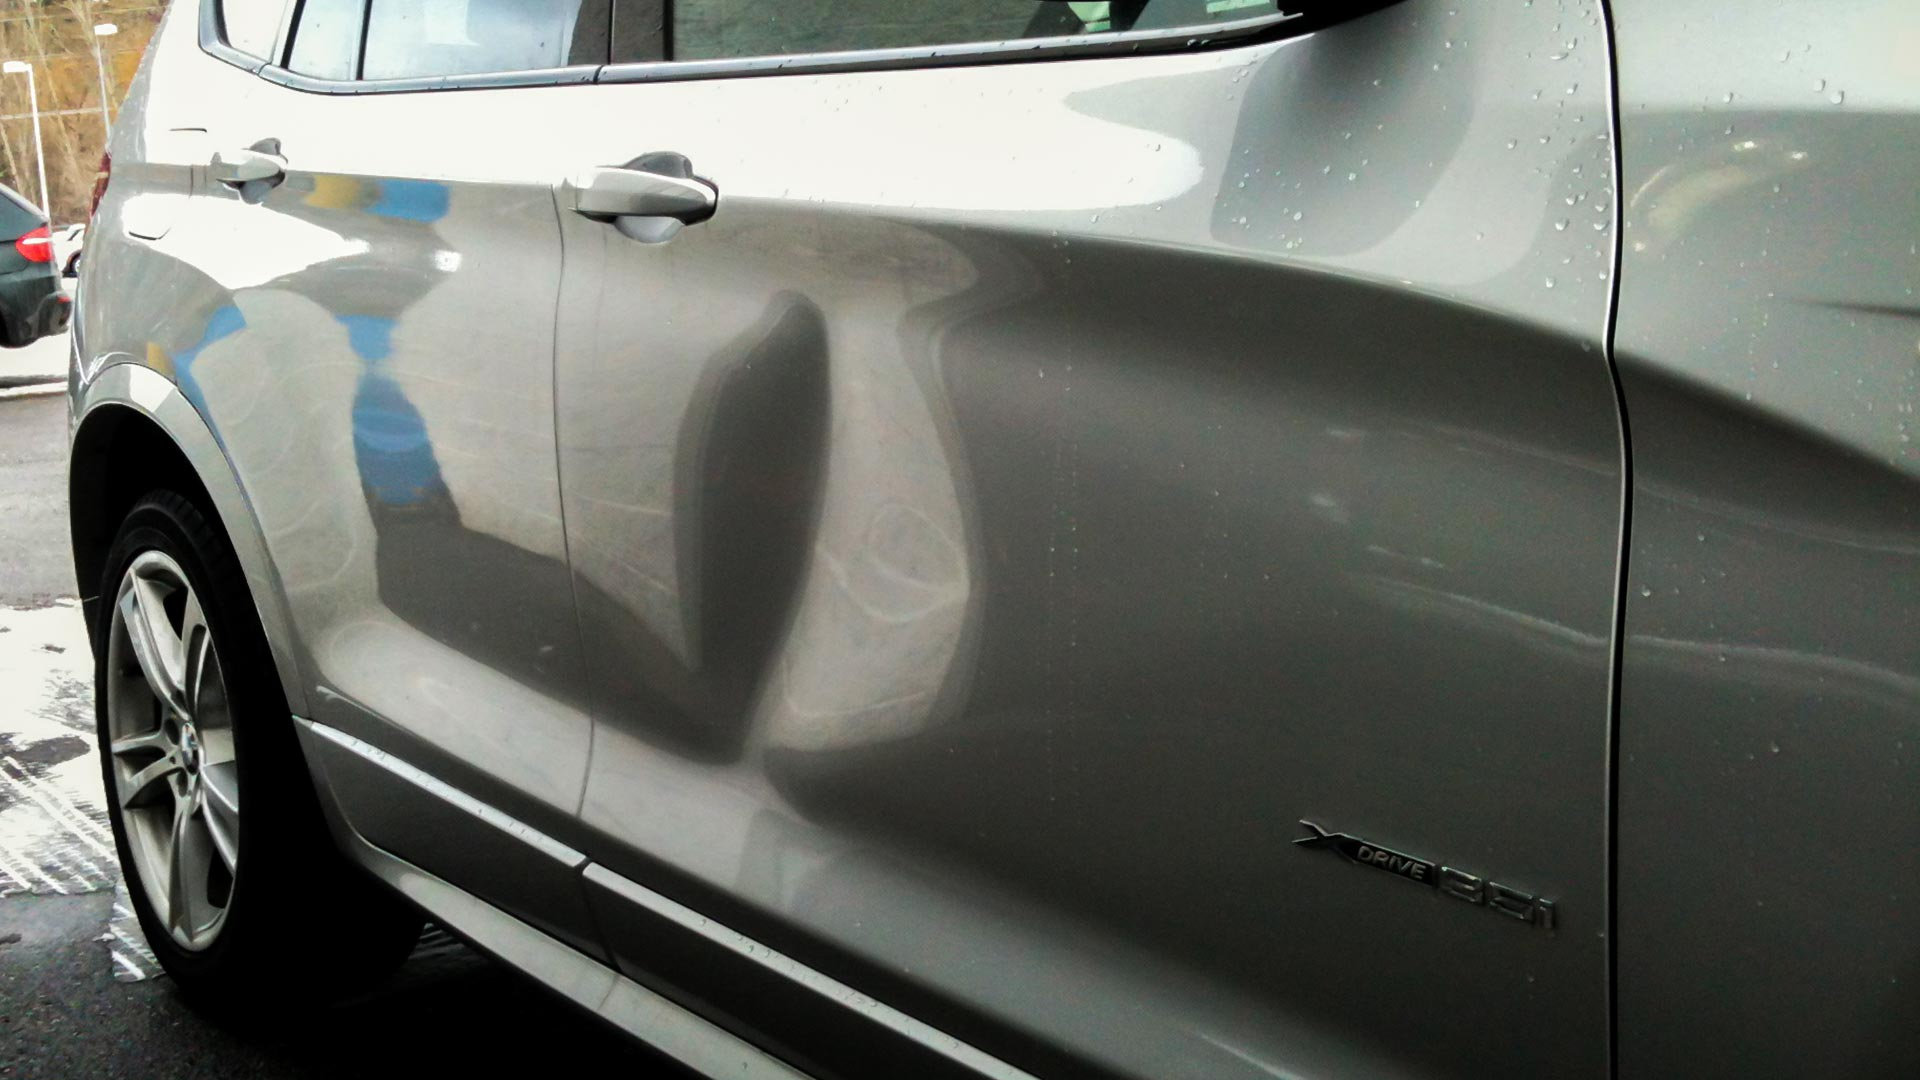 Dings And Dents >> 2013-bmw-x3-door-dent-main - Dentique Paintless Dent Repair